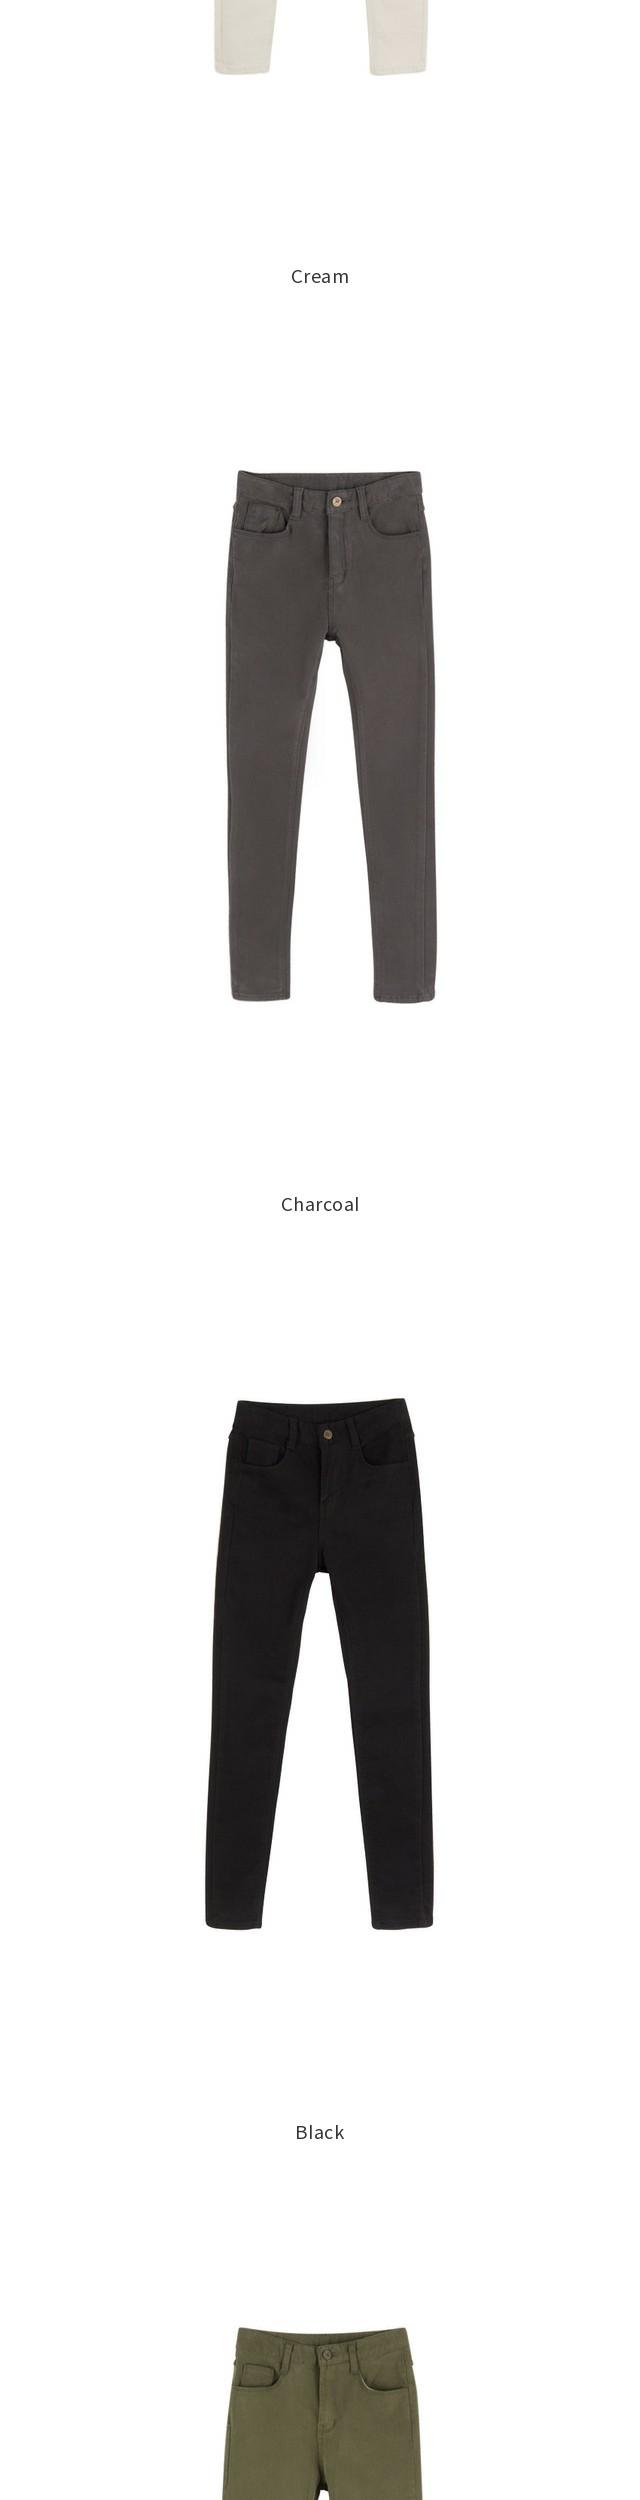 1172 brushed high waist pants